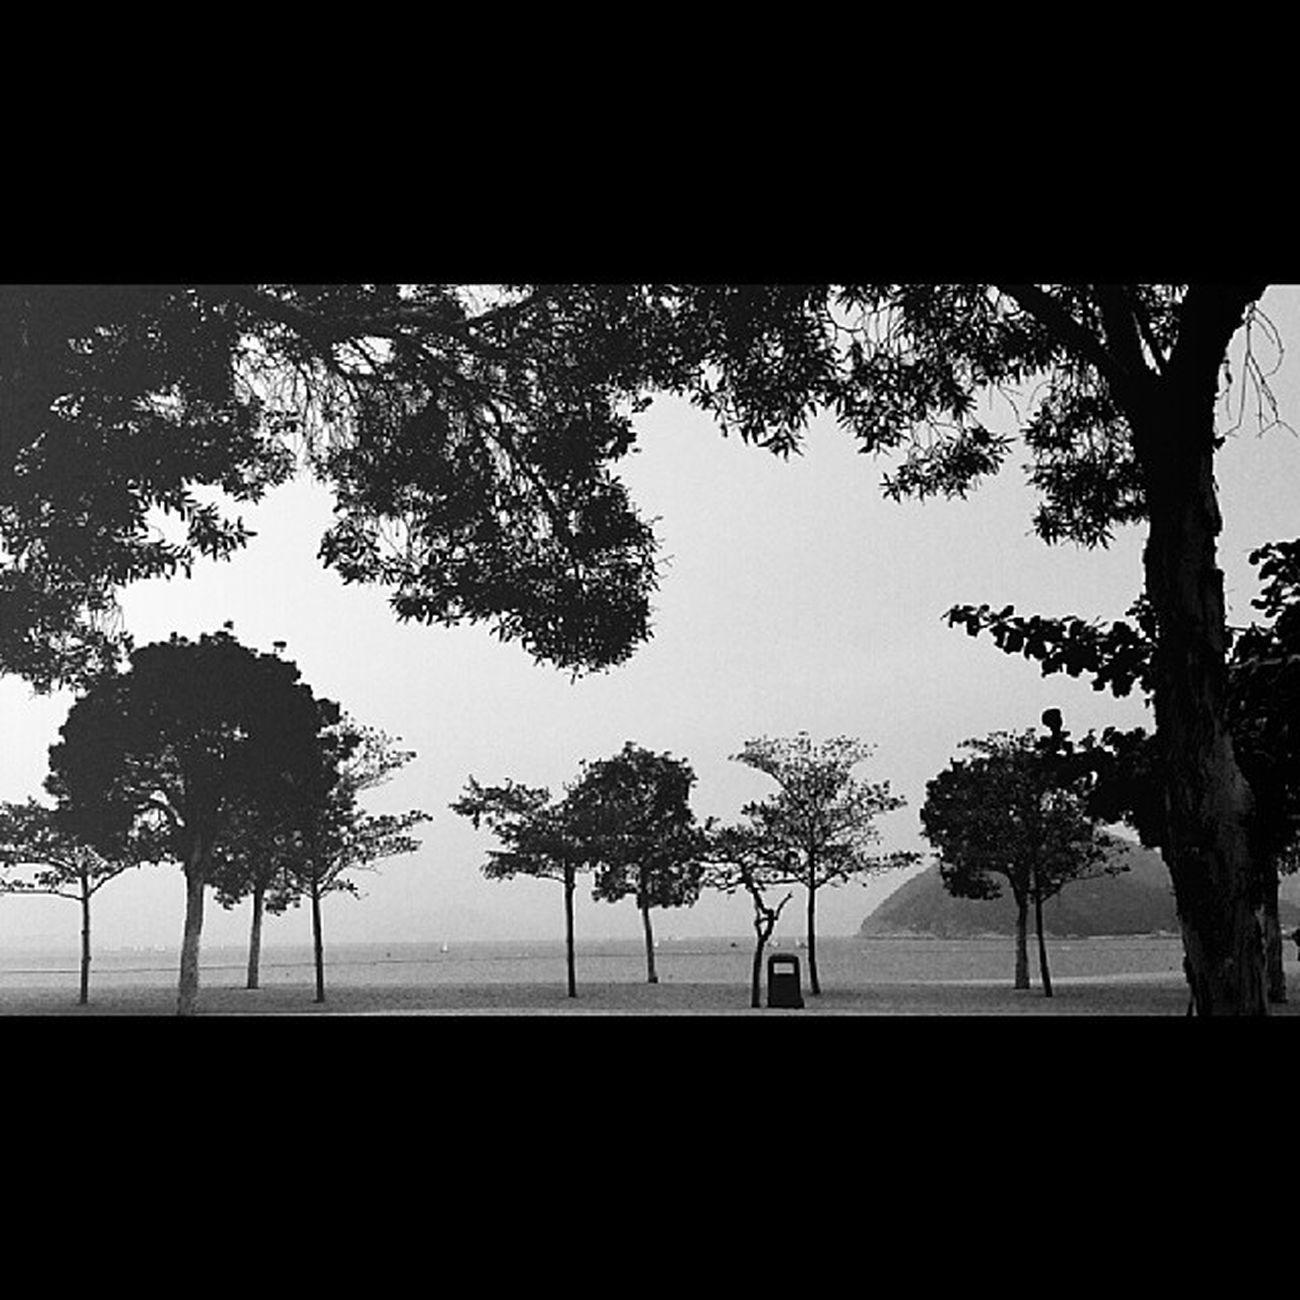 HongKong Beach Repulsebay Blackandwhite monochrome tree samsungnote3 landscape